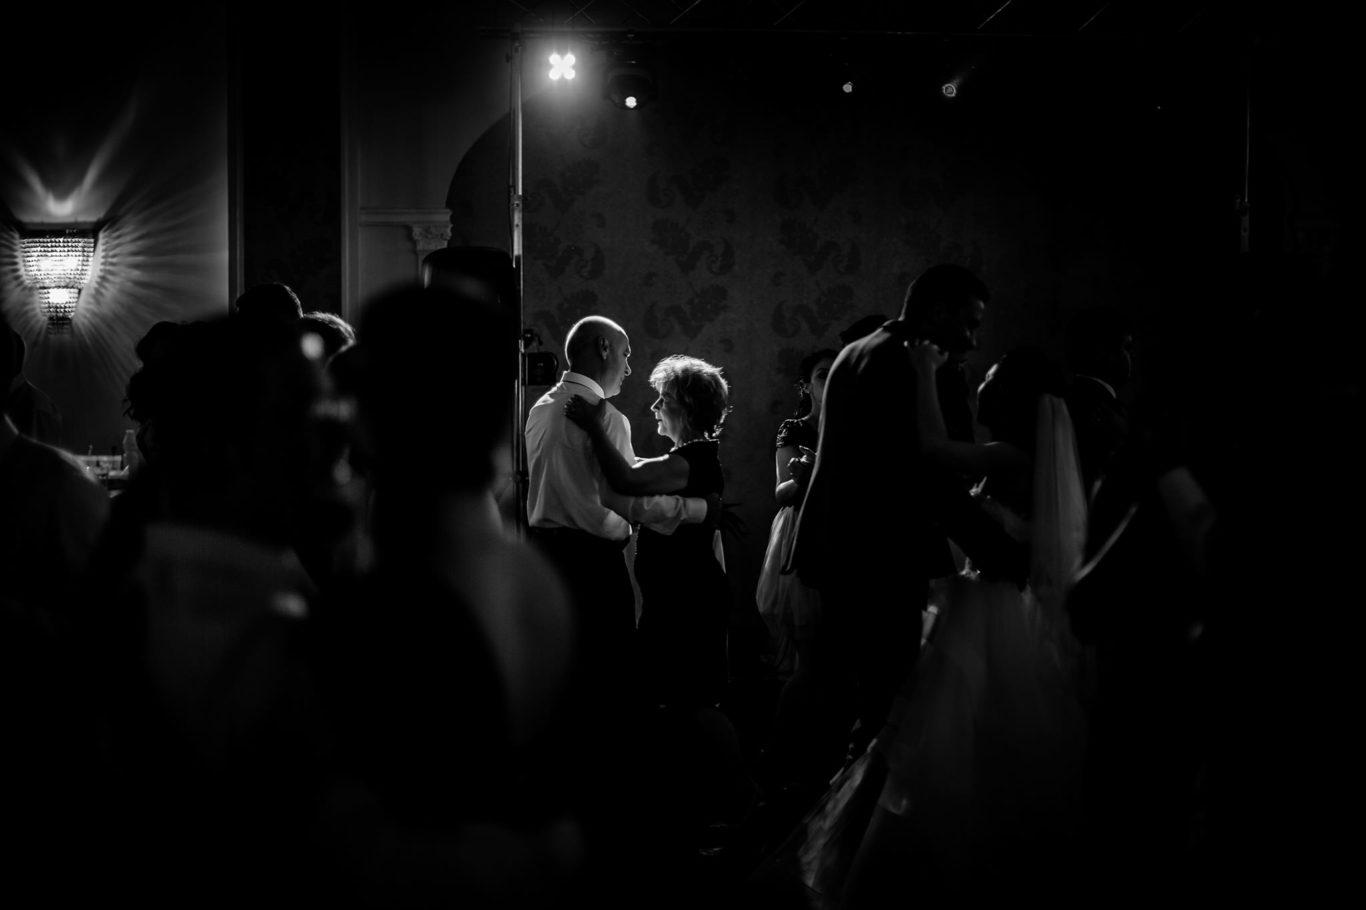 0586-fotografie-nunta-bucuresti-cristina-nicusor-fotograf-ciprian-dumitrescu-cd2_0320-2